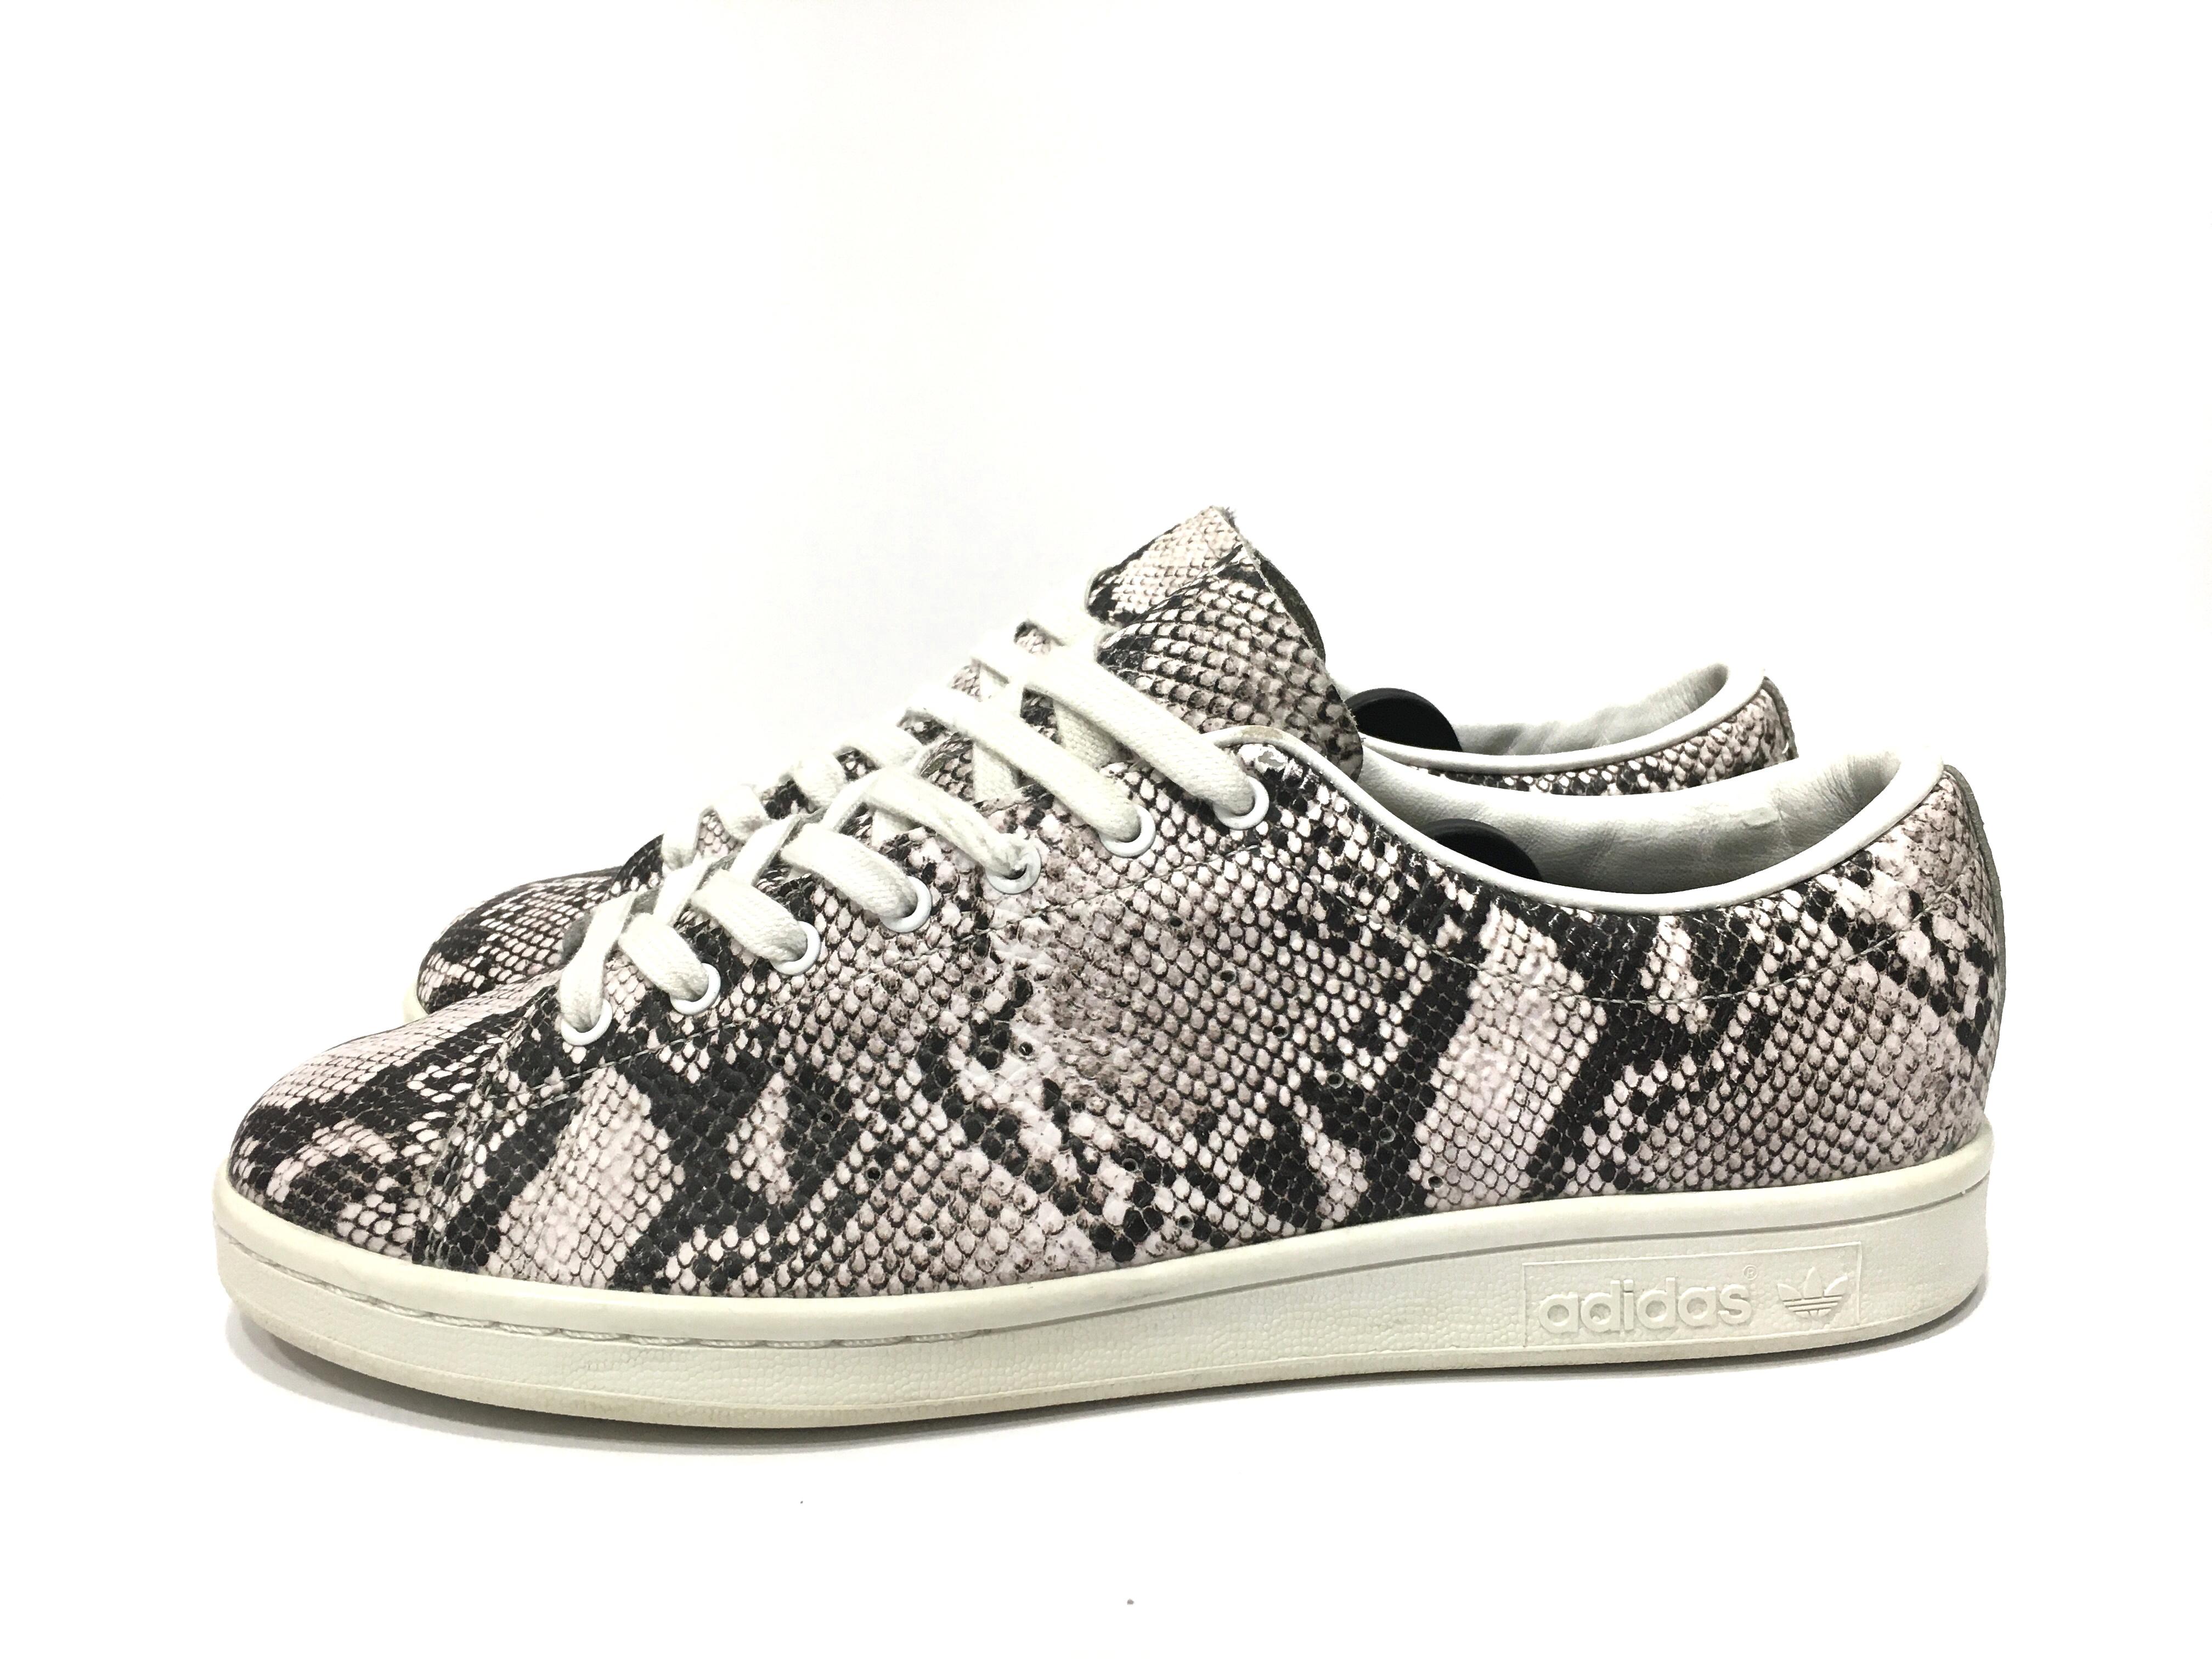 Hyke x Adidas Originals Stan Smith snakeskin sneakers